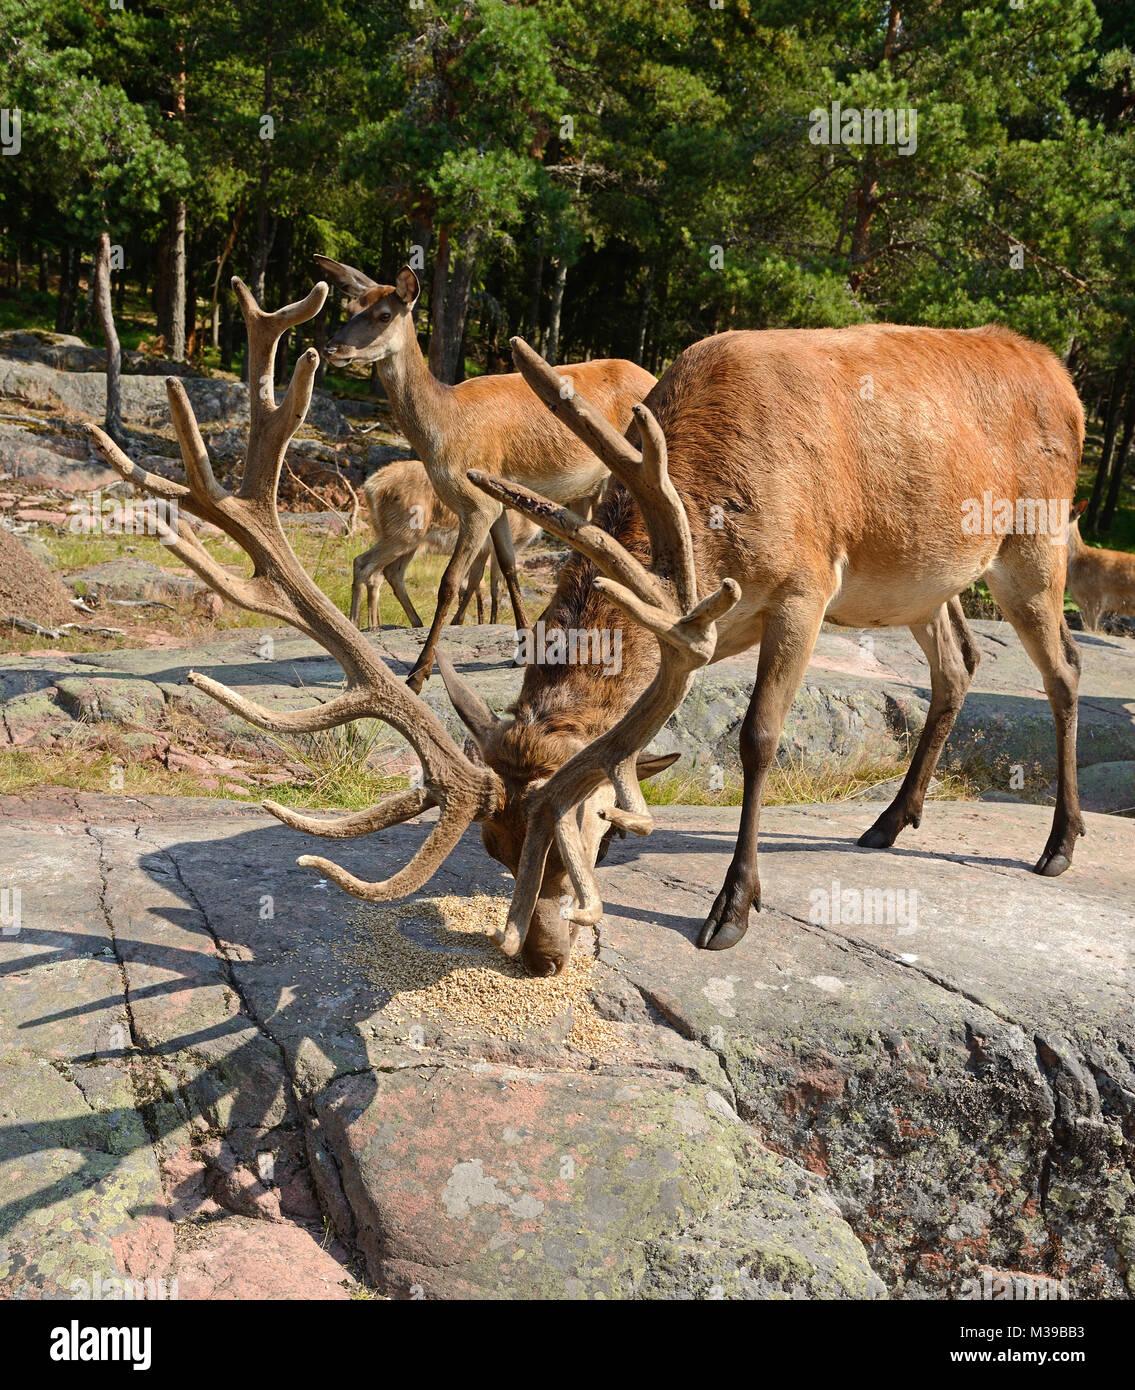 Red deer (Cervus elaphus)  eat grain - Stock Image